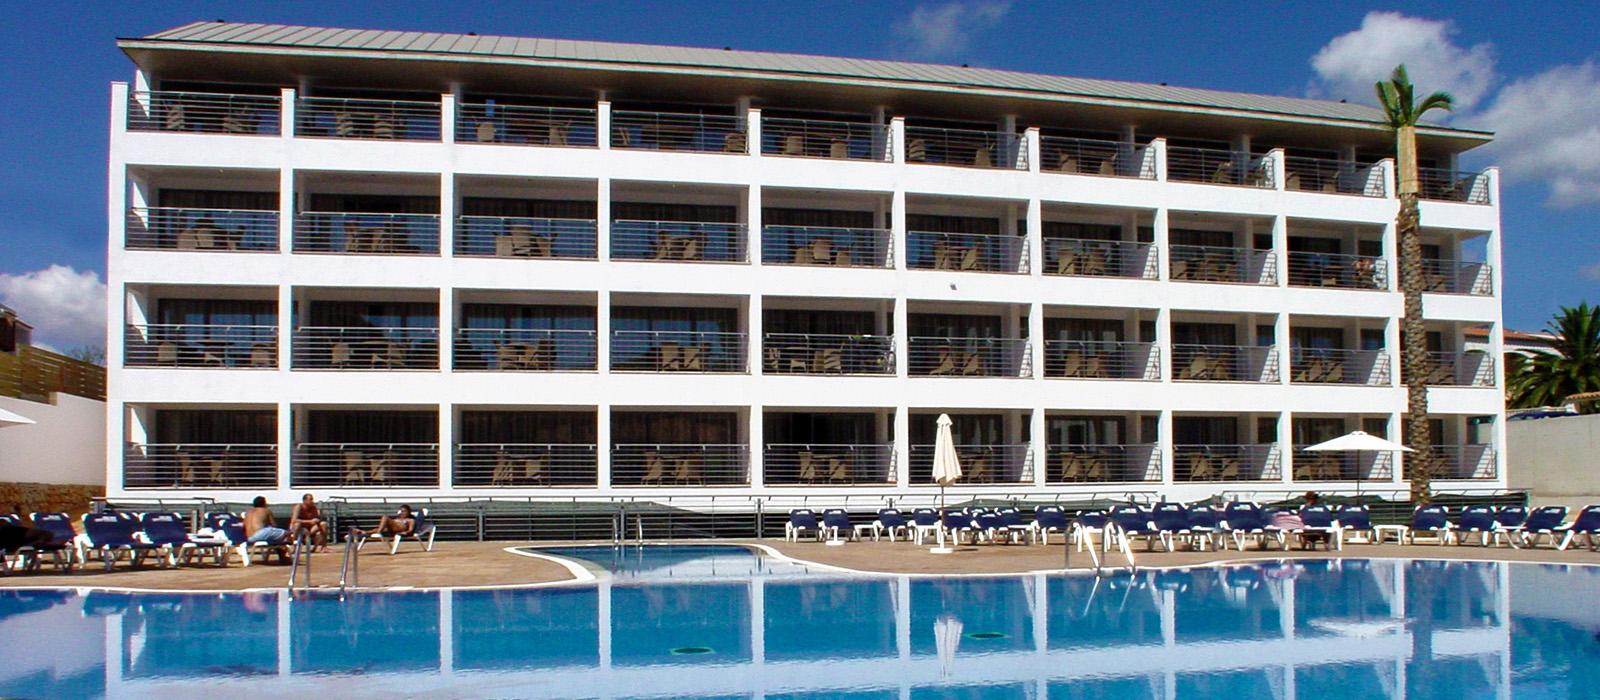 hotel_alcocebre_fergus